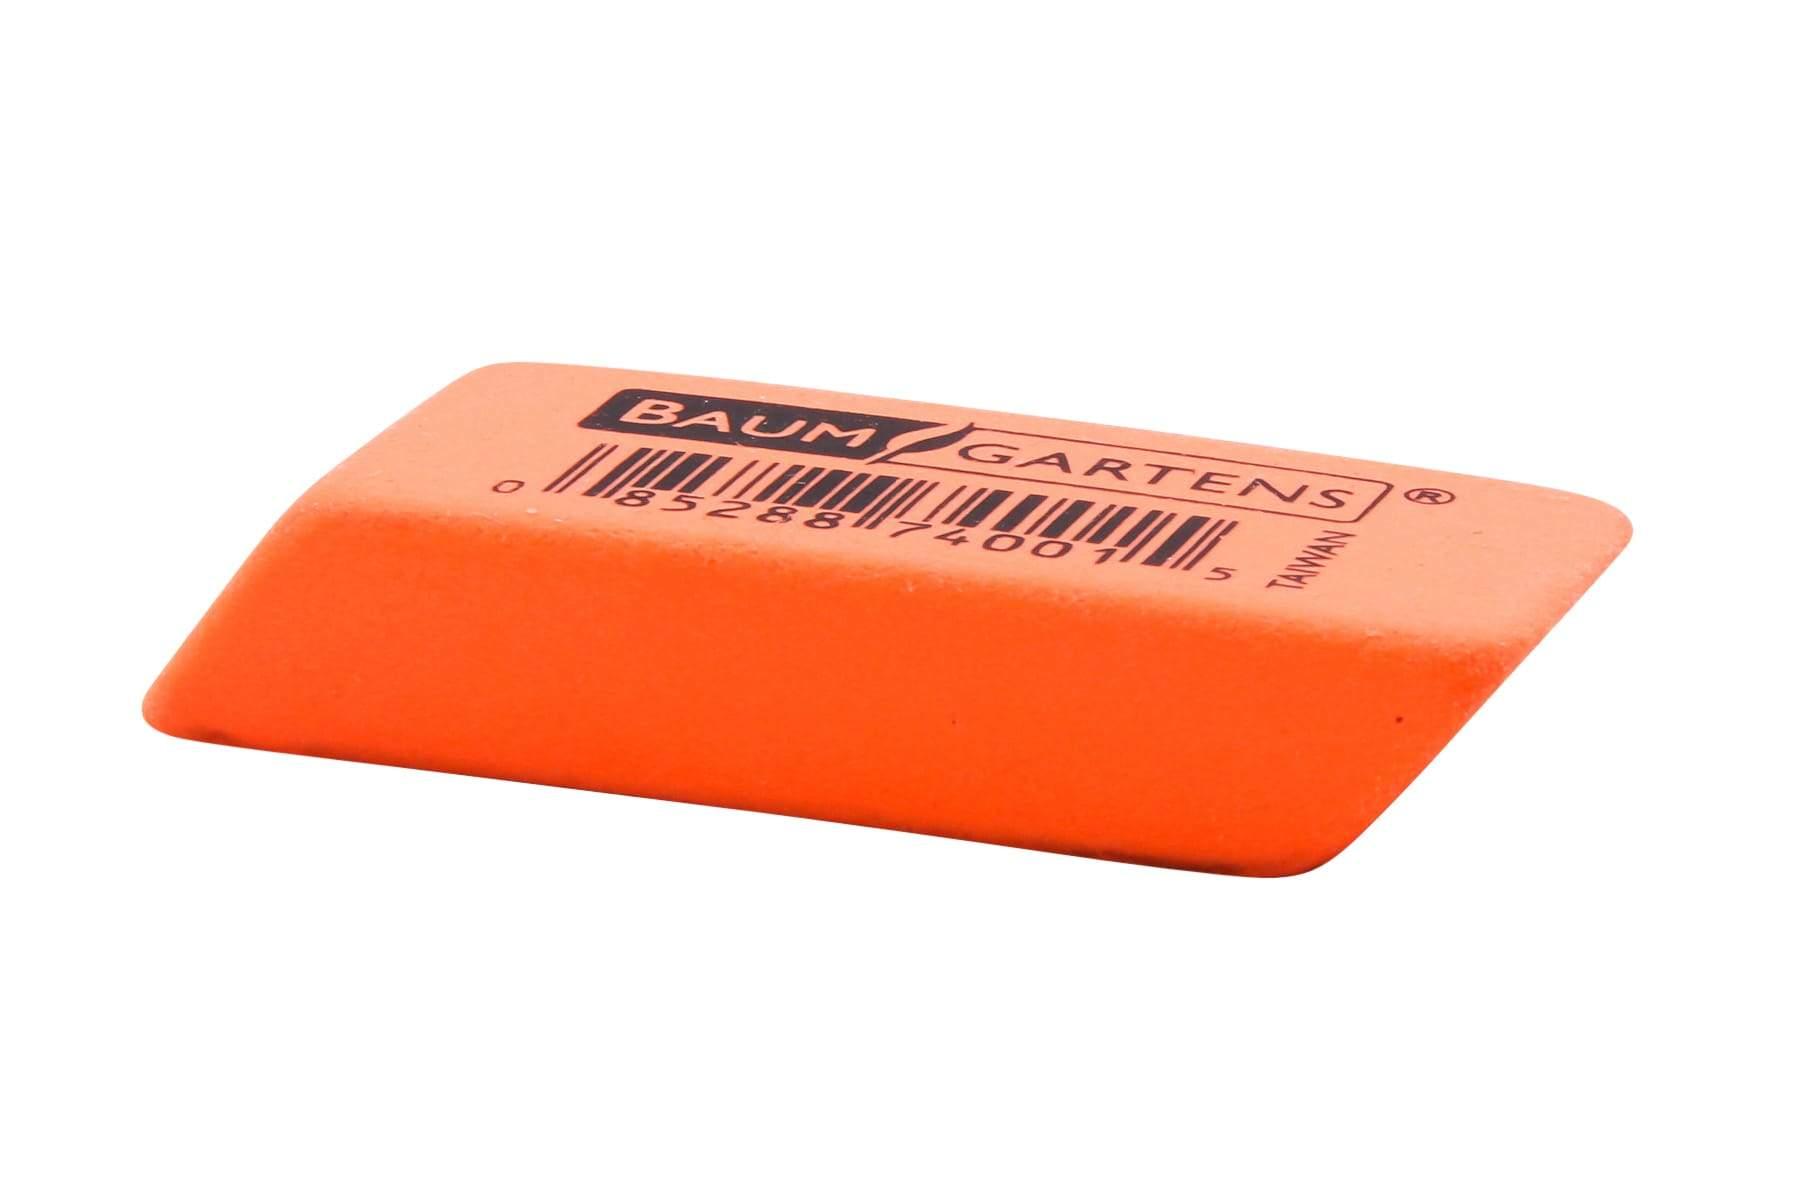 Baumgartens Neon Eraser